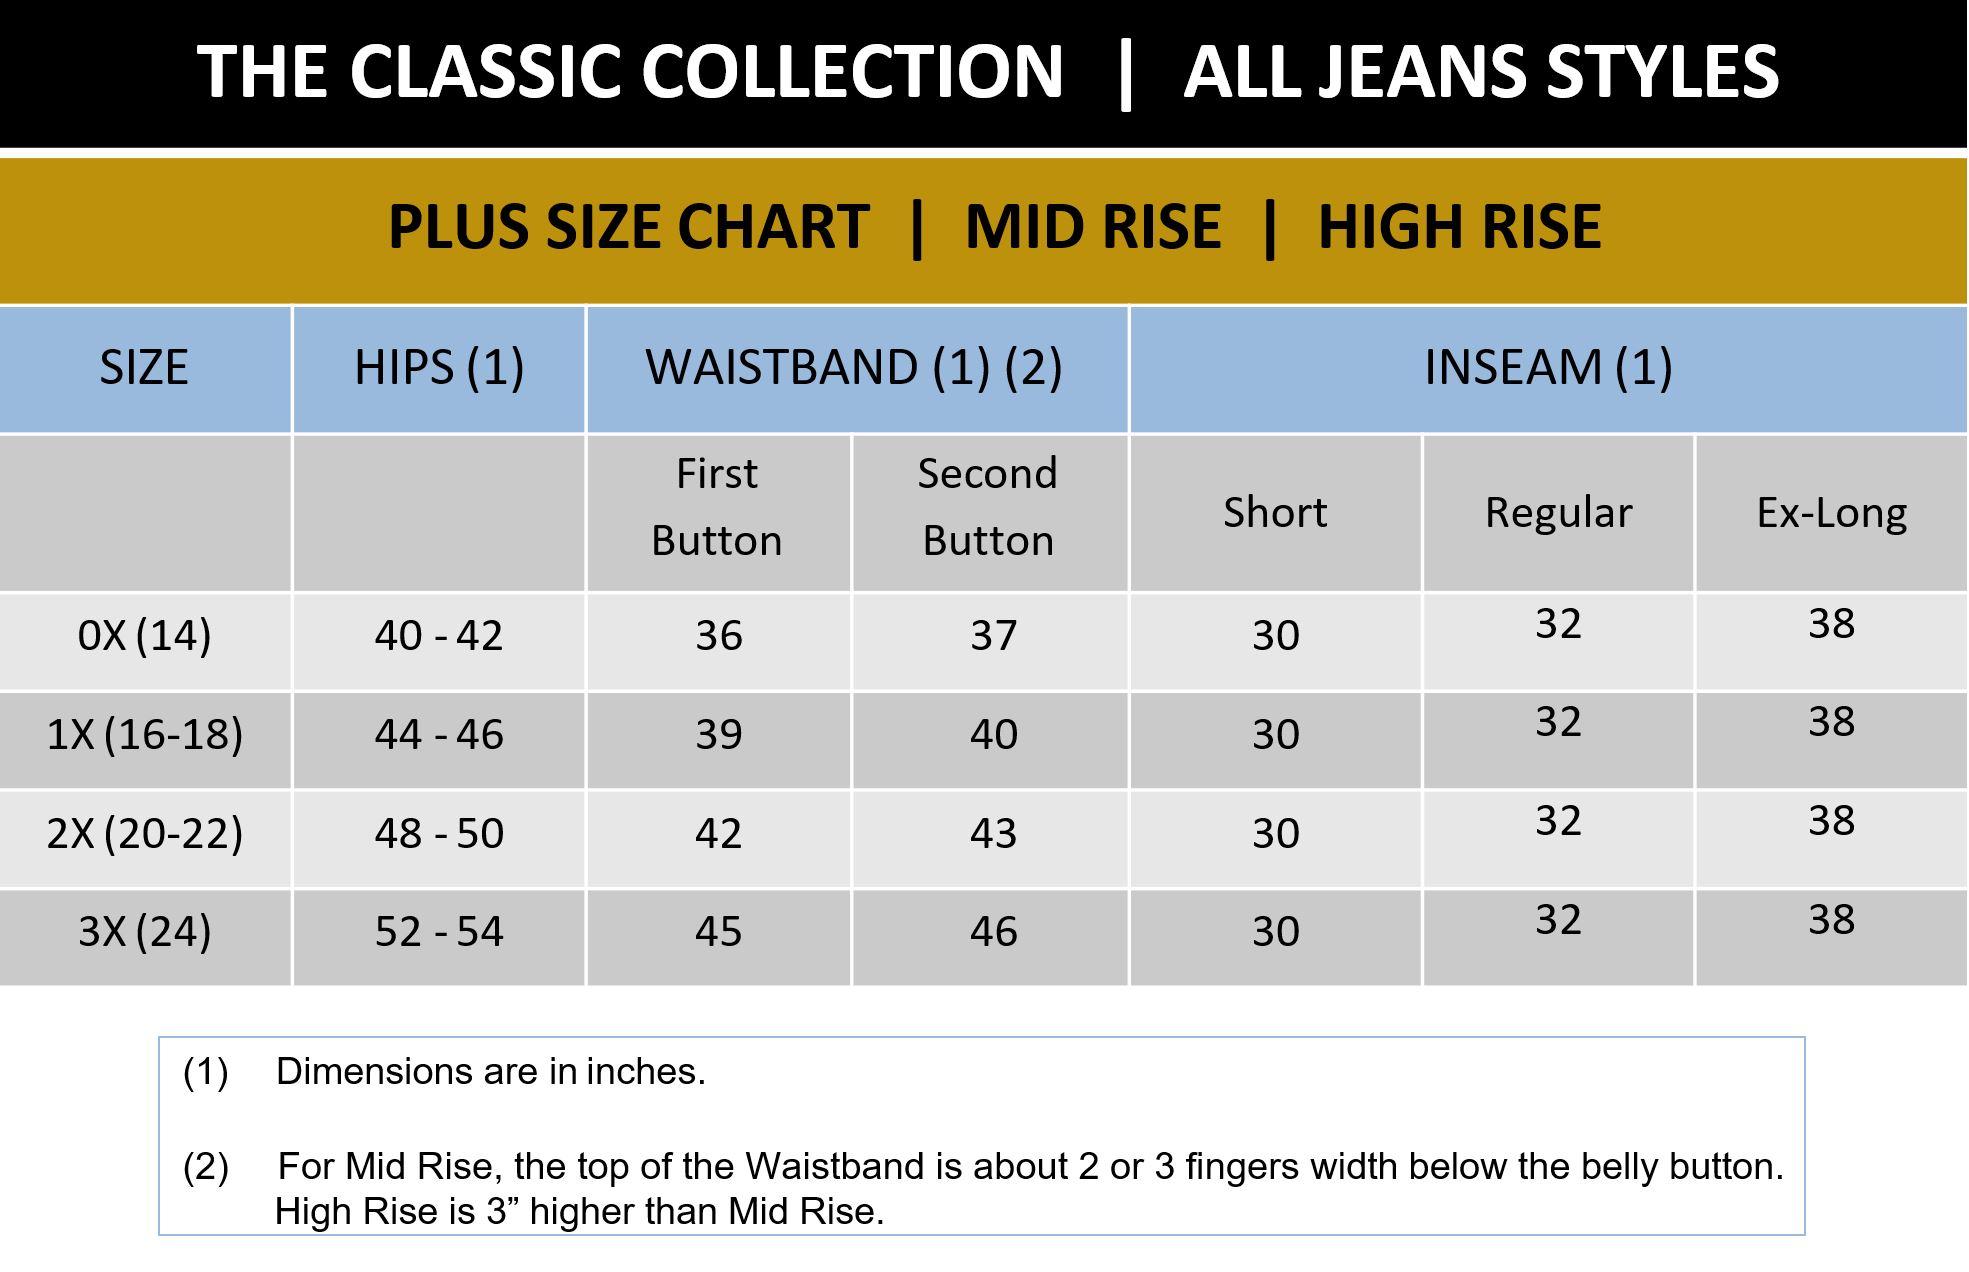 classic-collection.plus-size-chart.21april2020.jpg